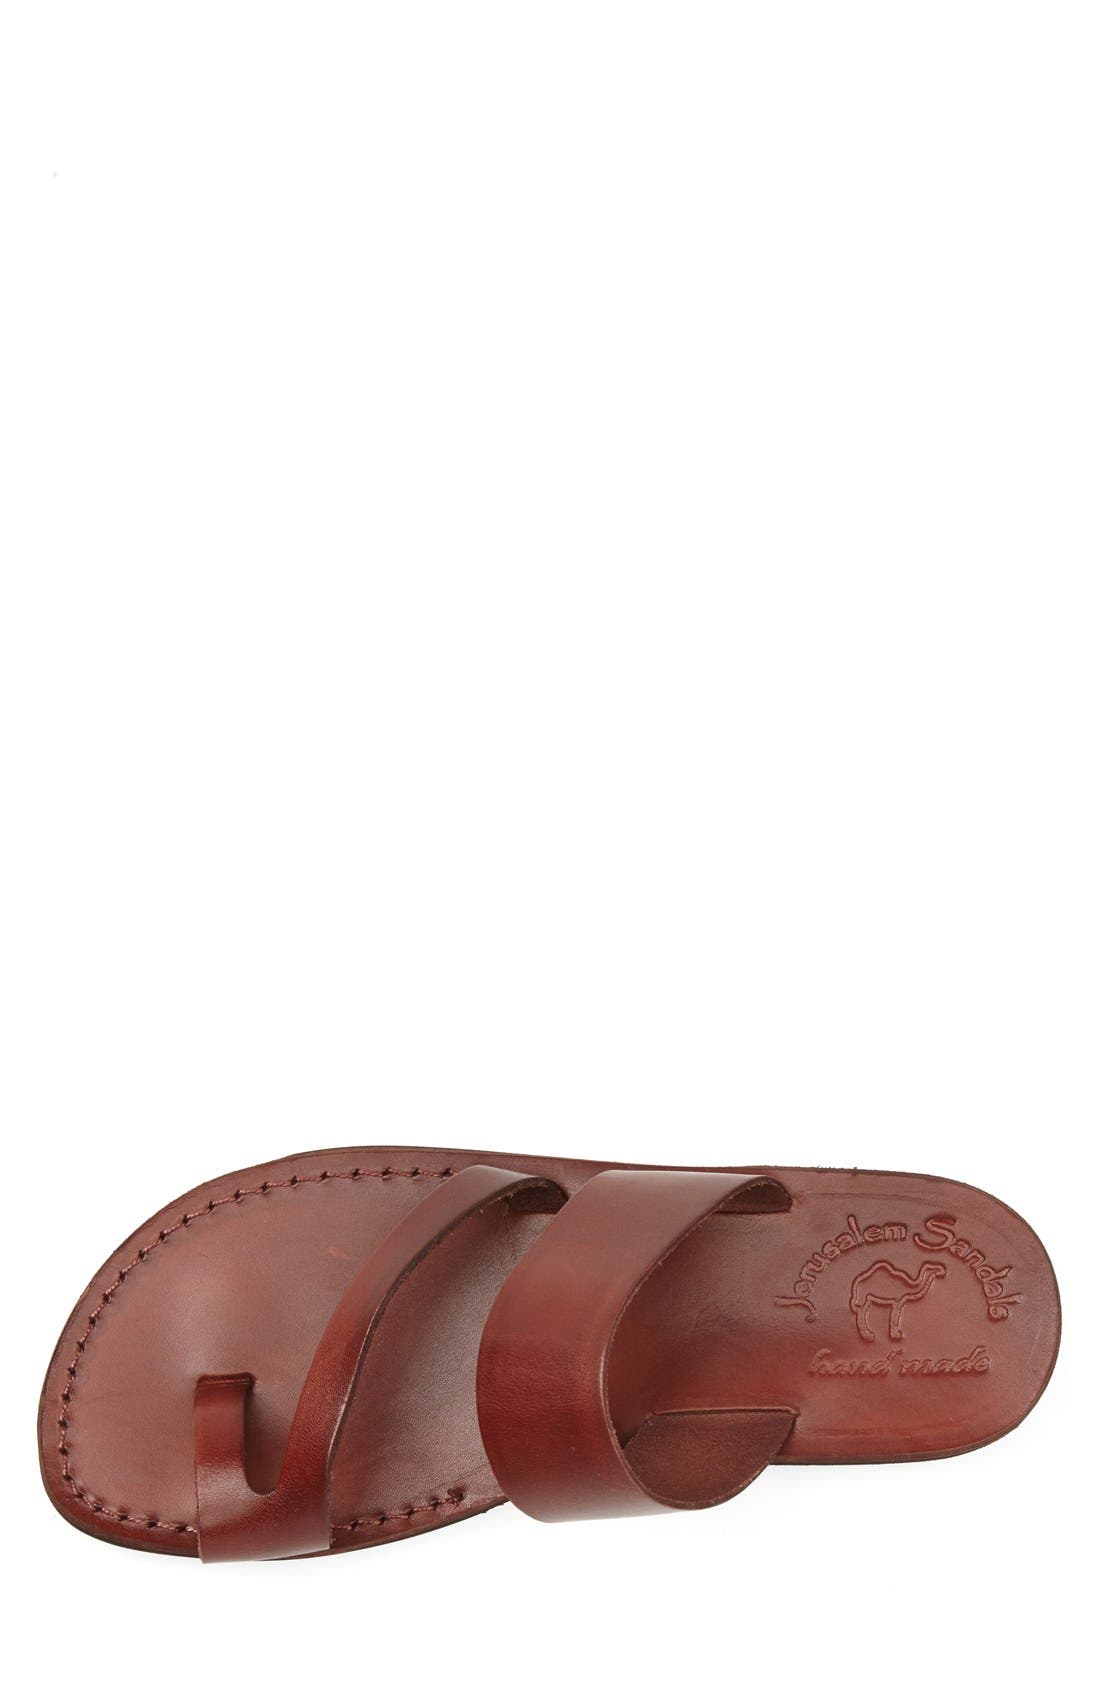 'Zohar' Leather Sandal,                             Alternate thumbnail 3, color,                             BROWN